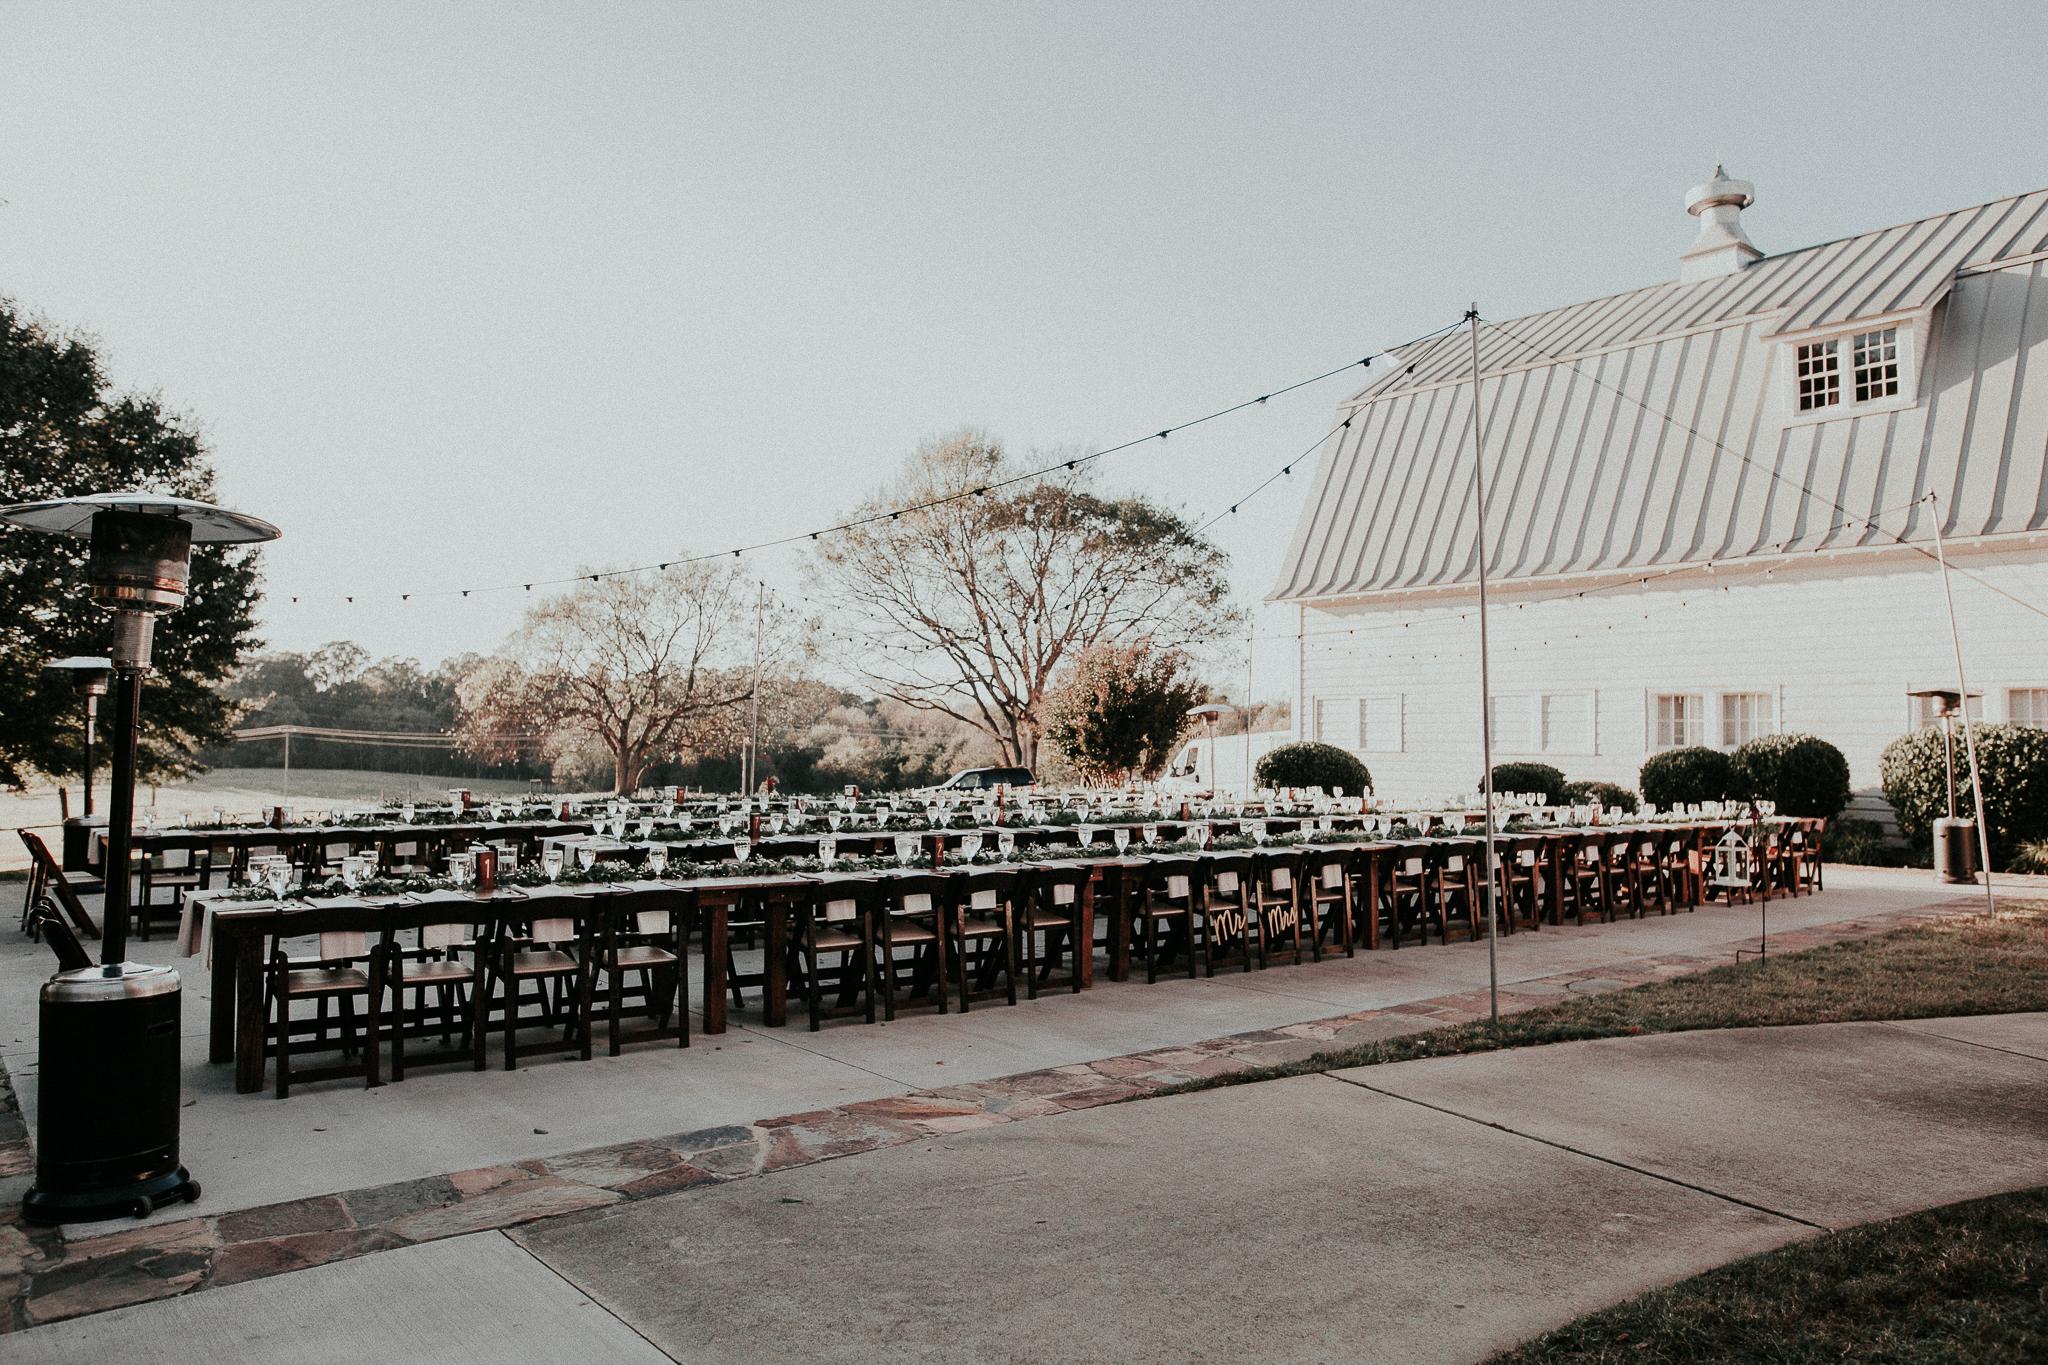 Weddings-at-Dairy-Barn